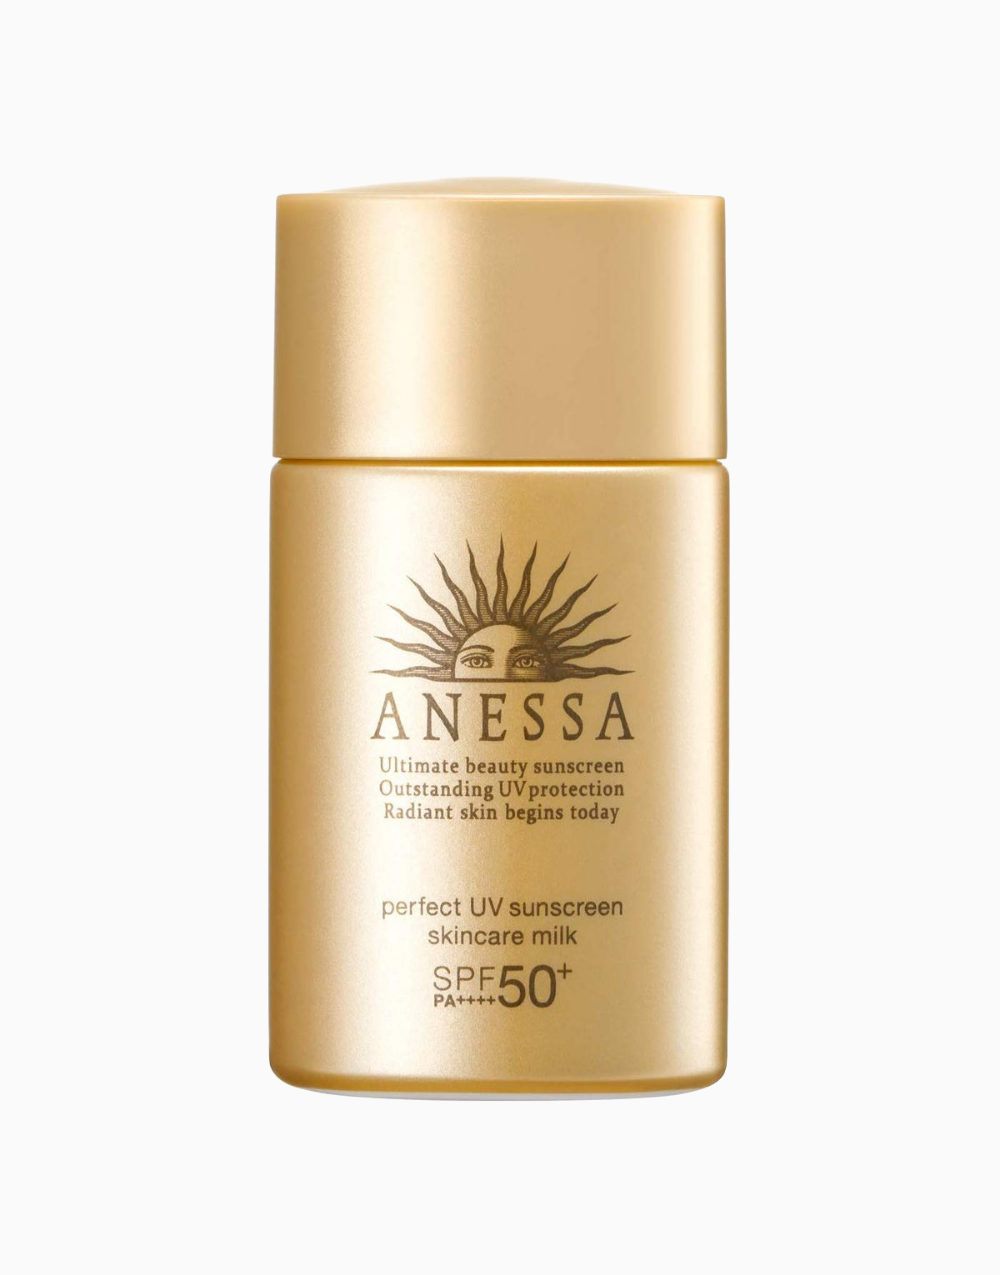 Perfect UV Sunscreen Skincare Milk SPF 50+ PA++++ (20ml) by Anessa